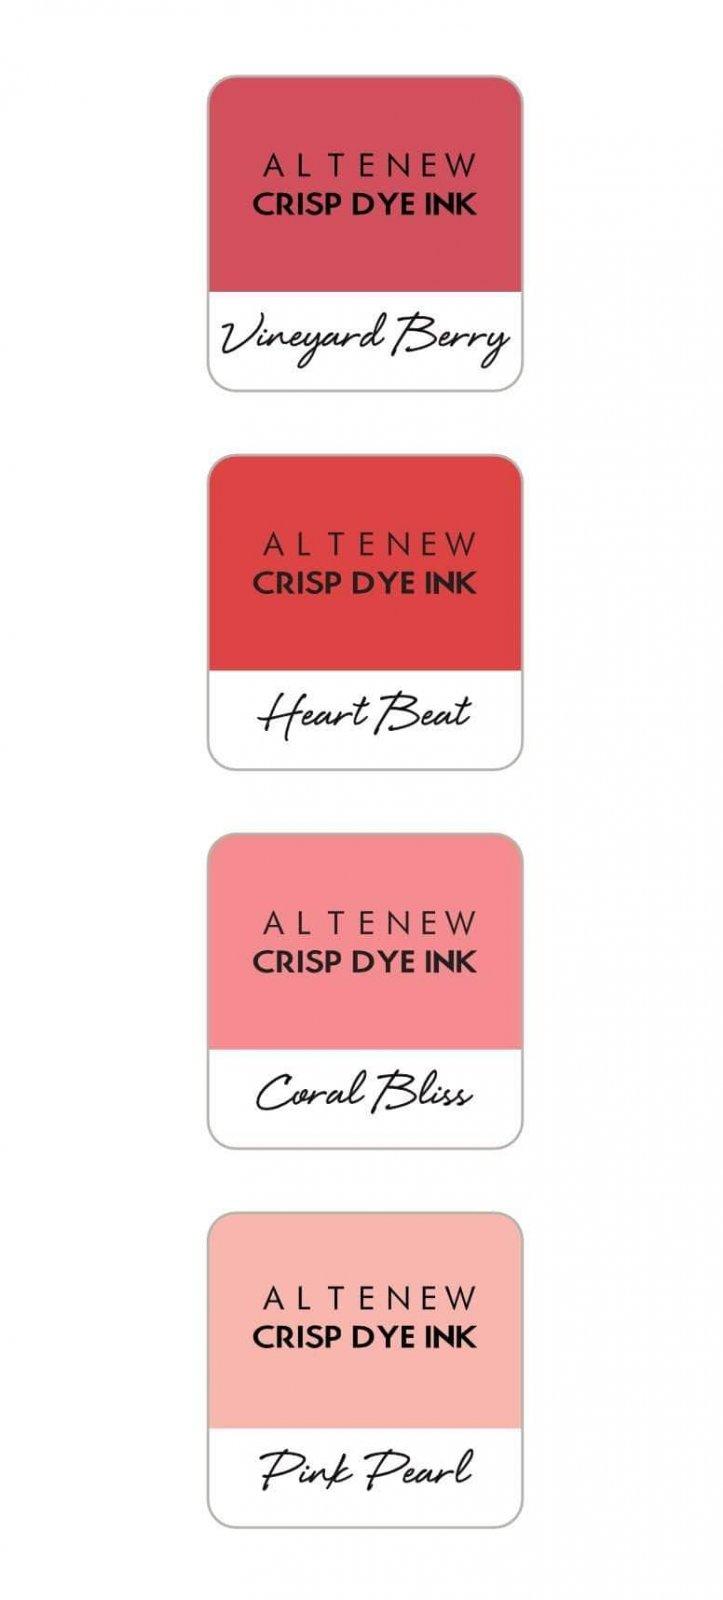 Altenew - Tea Party Crispy Dye Ink Mini Cube Set